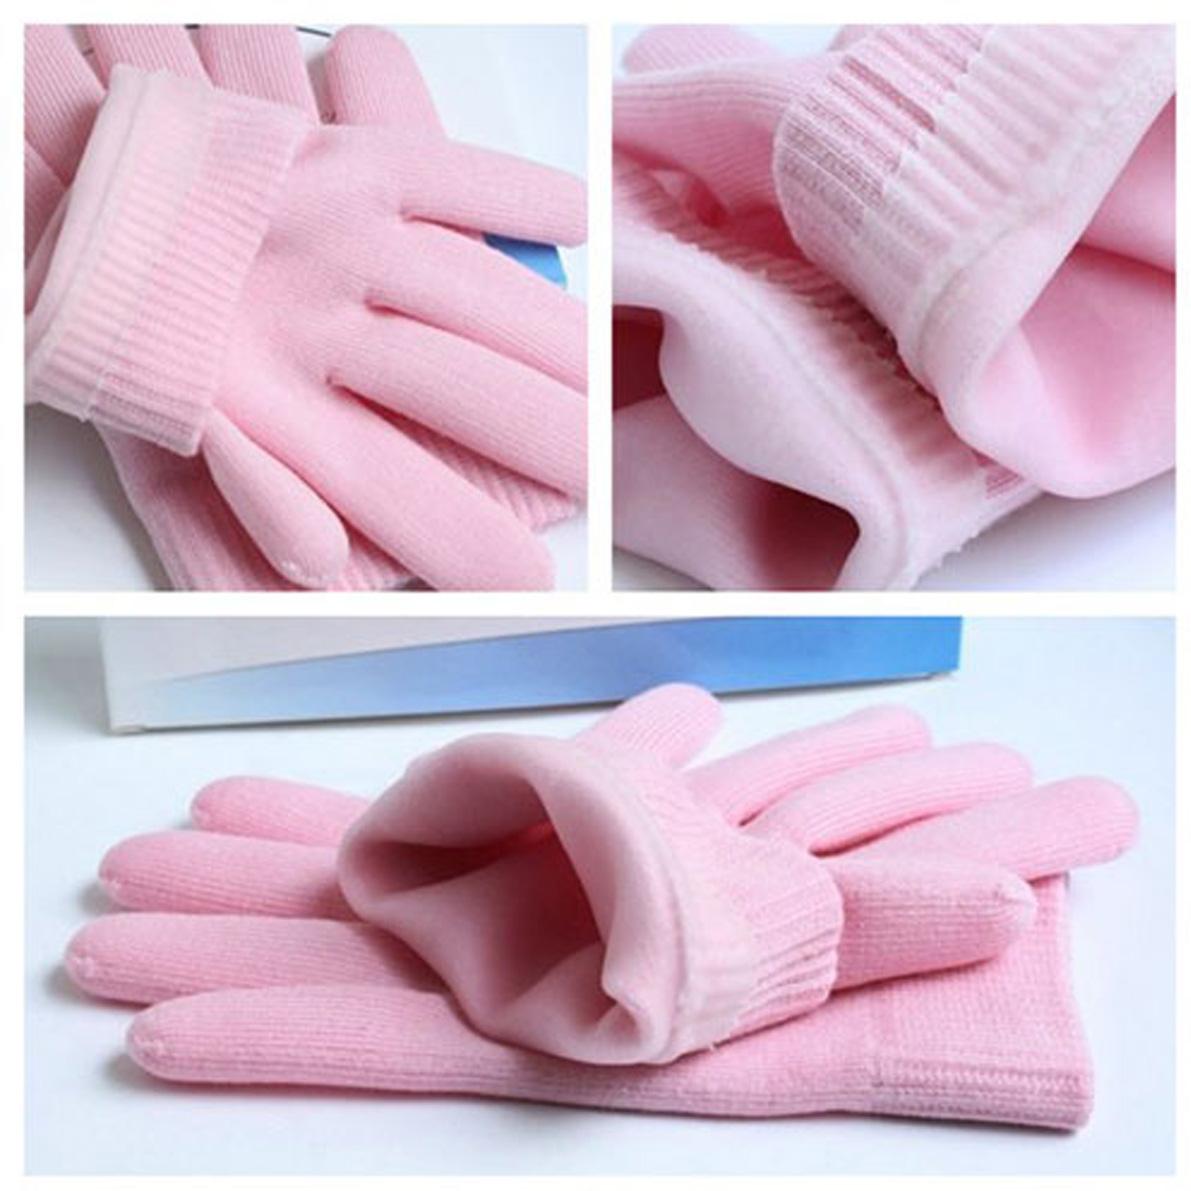 GessУвлажняющие гелевые перчатки Sweety Gess